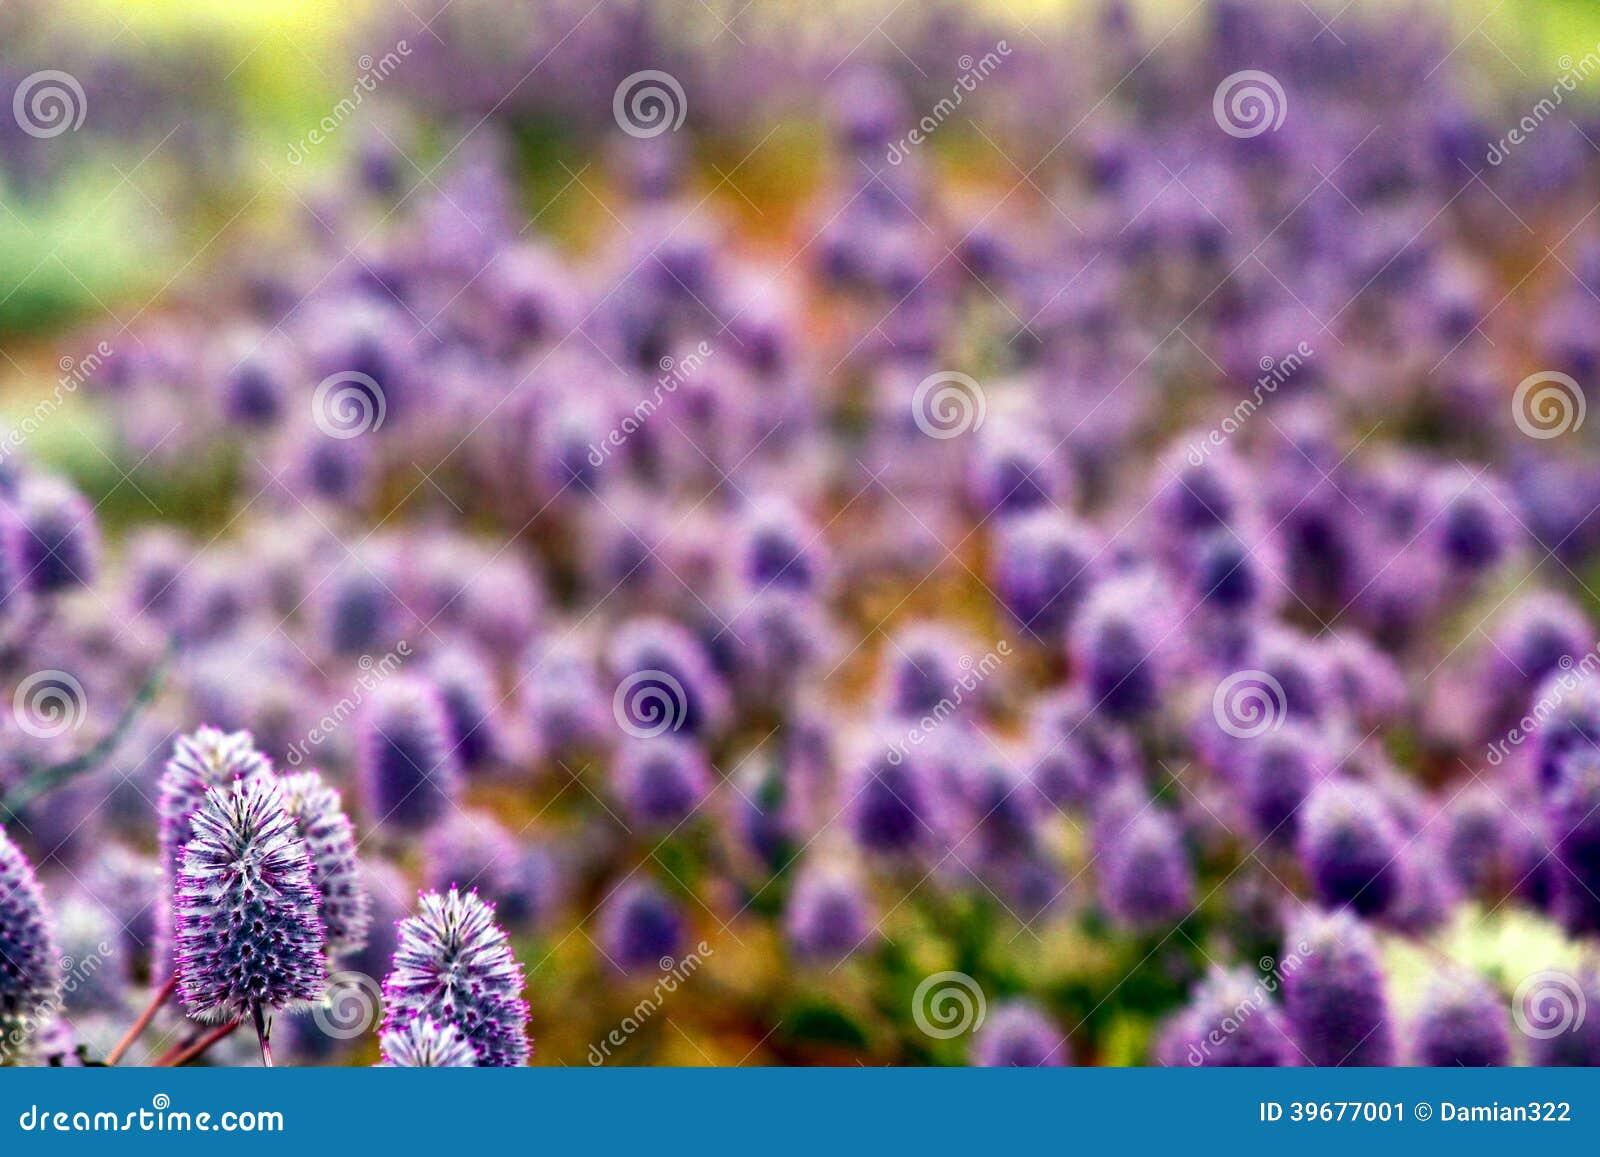 Floral Background Of Violet Pink Flowers Australia Stock Image